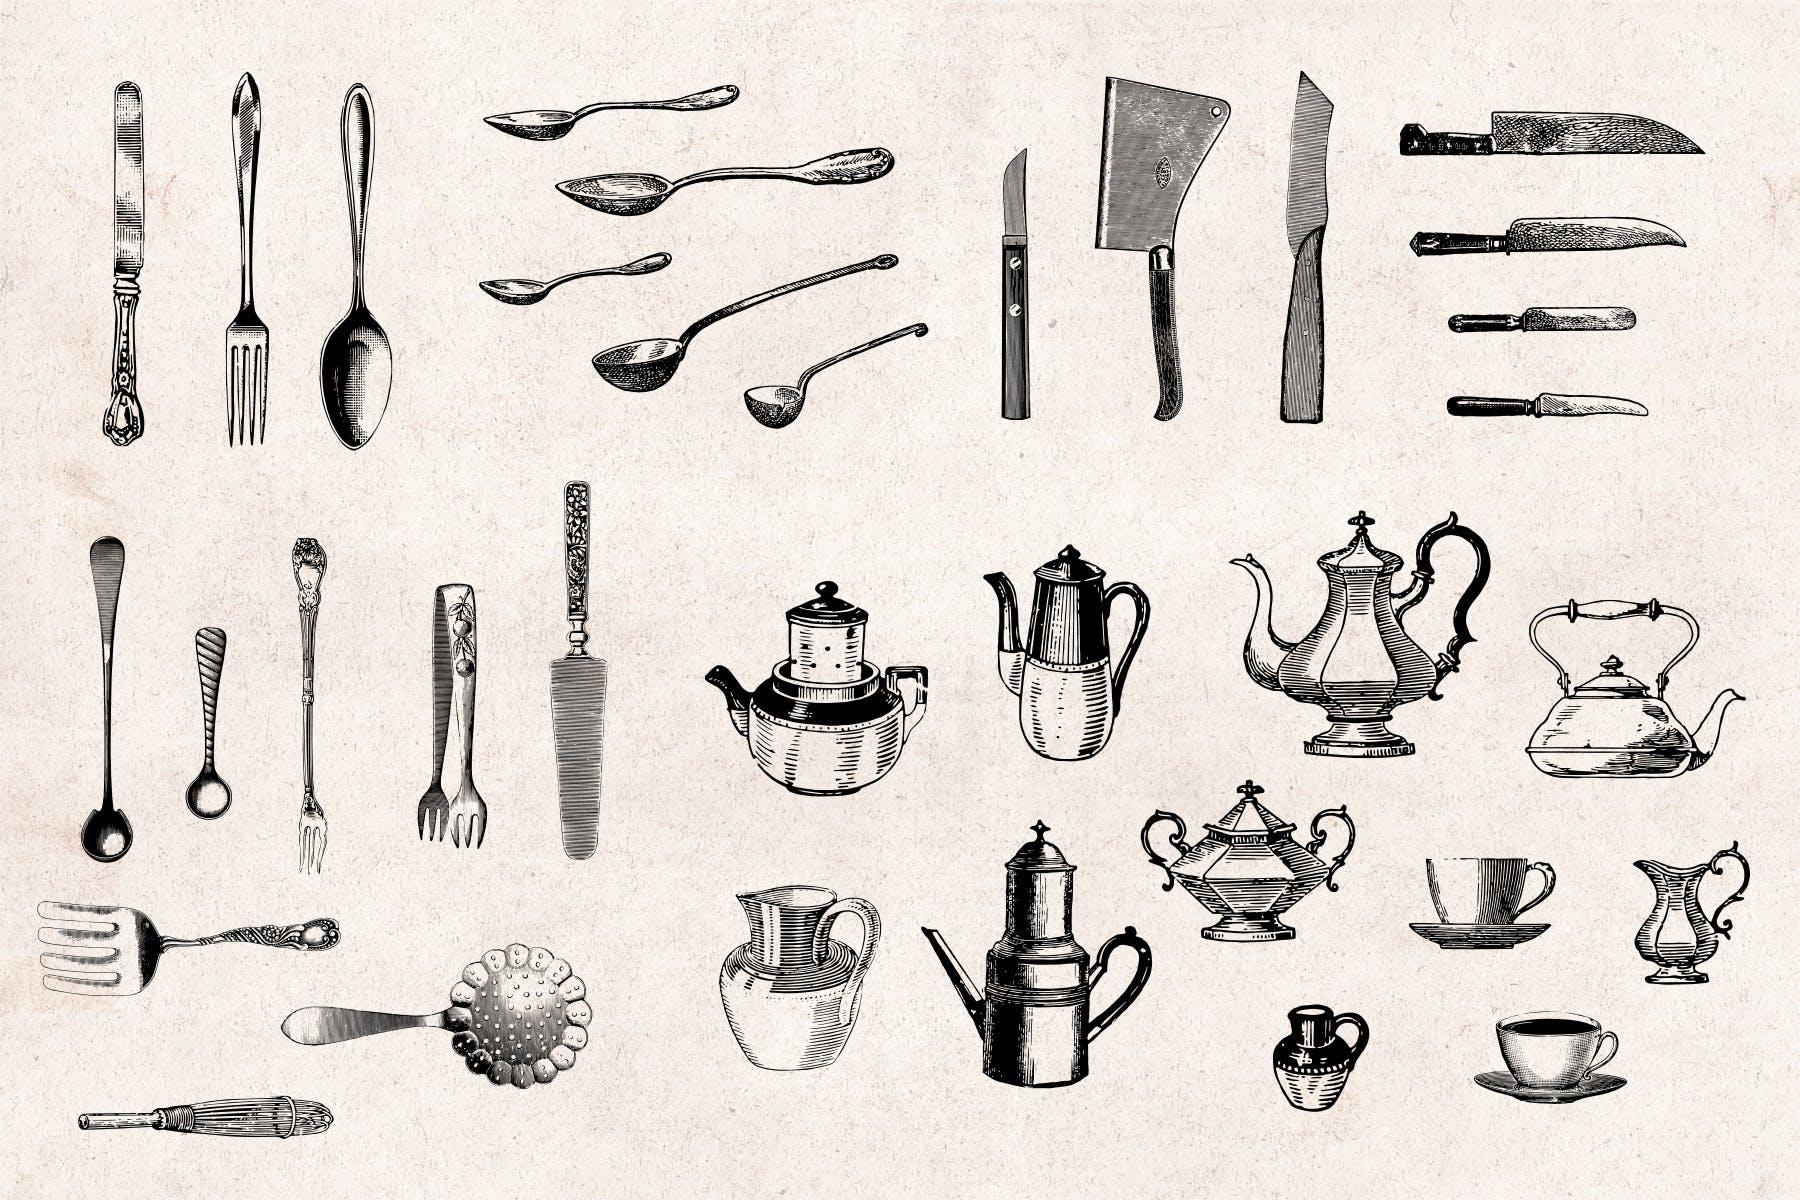 84个矢量复古手绘厨房工具和用具元素Kitchenware Engraving Illustration Set插图(1)